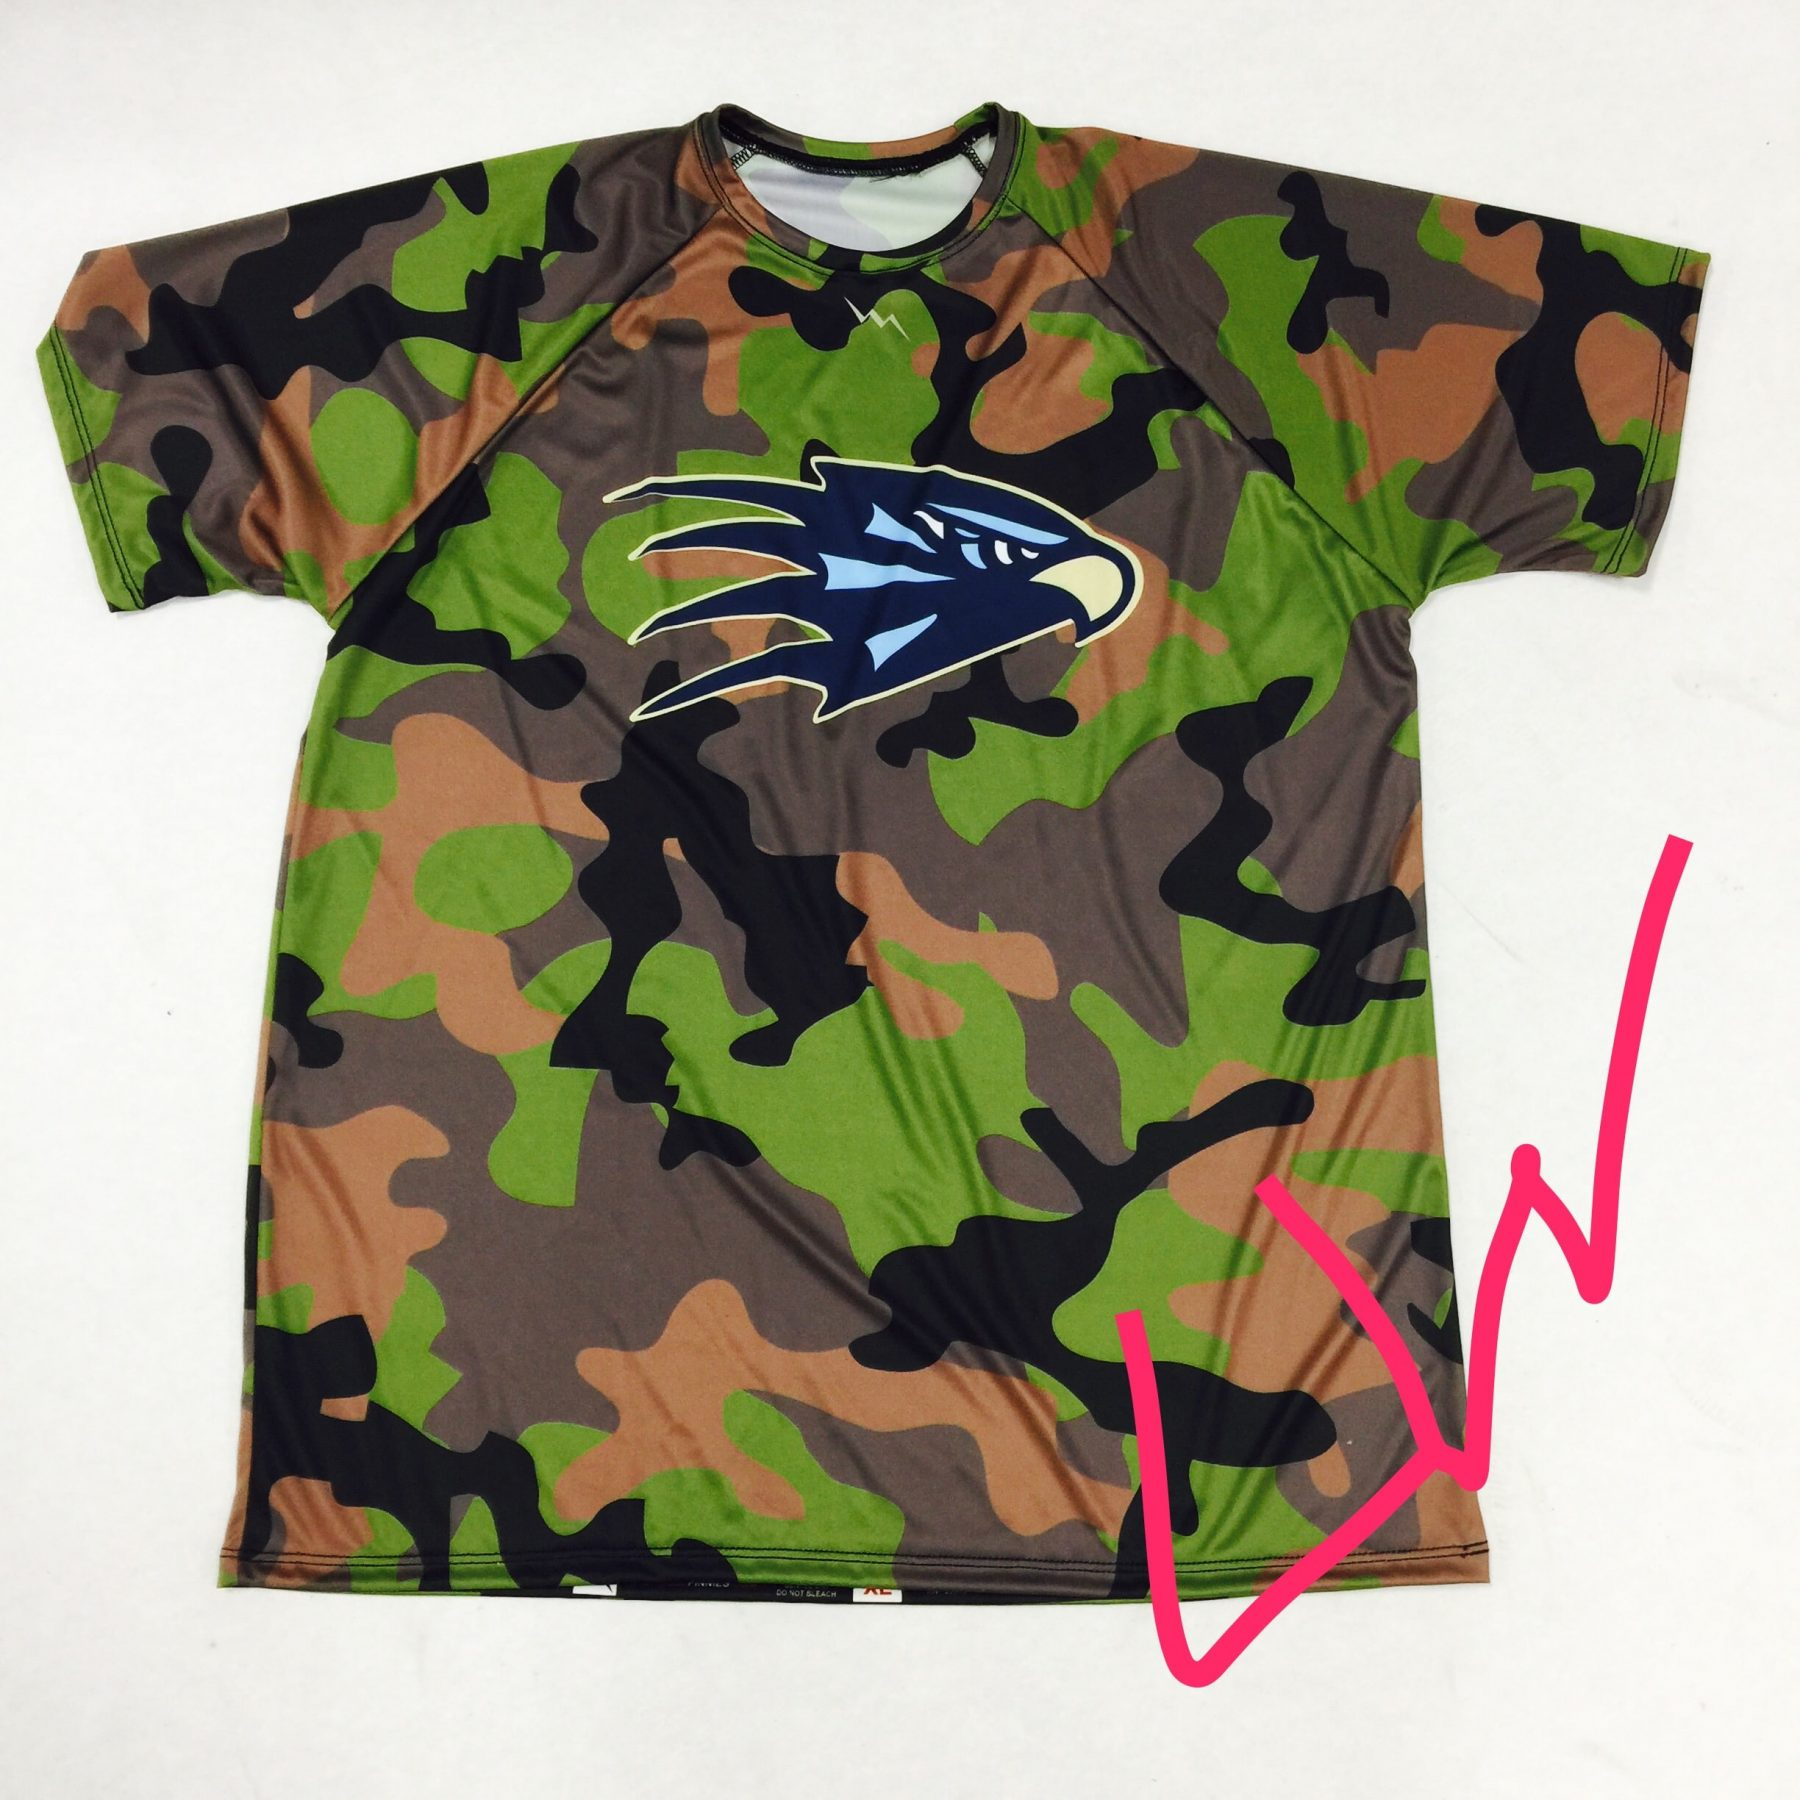 Camouflage Basketball Shirts